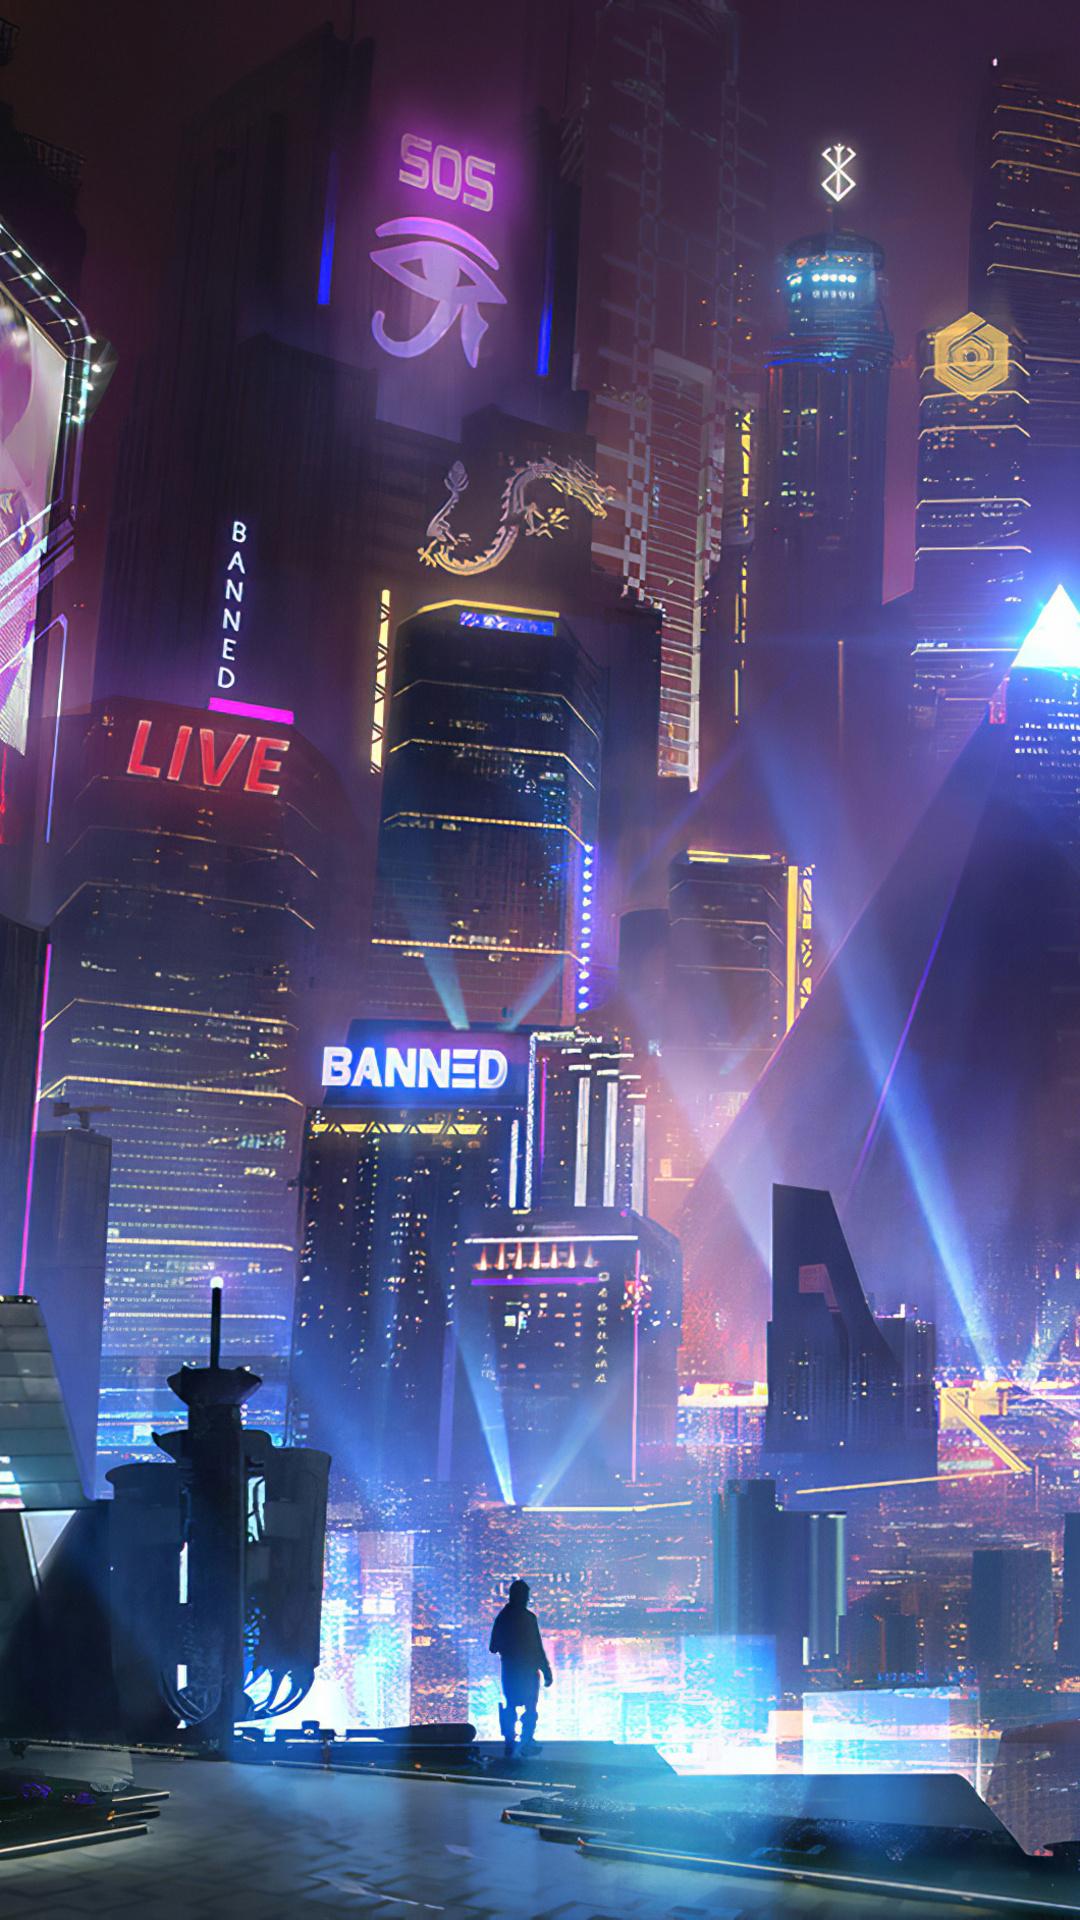 1080x1920 Cyberpunk City 4k Iphone 7,6s,6 Plus, Pixel xl ...